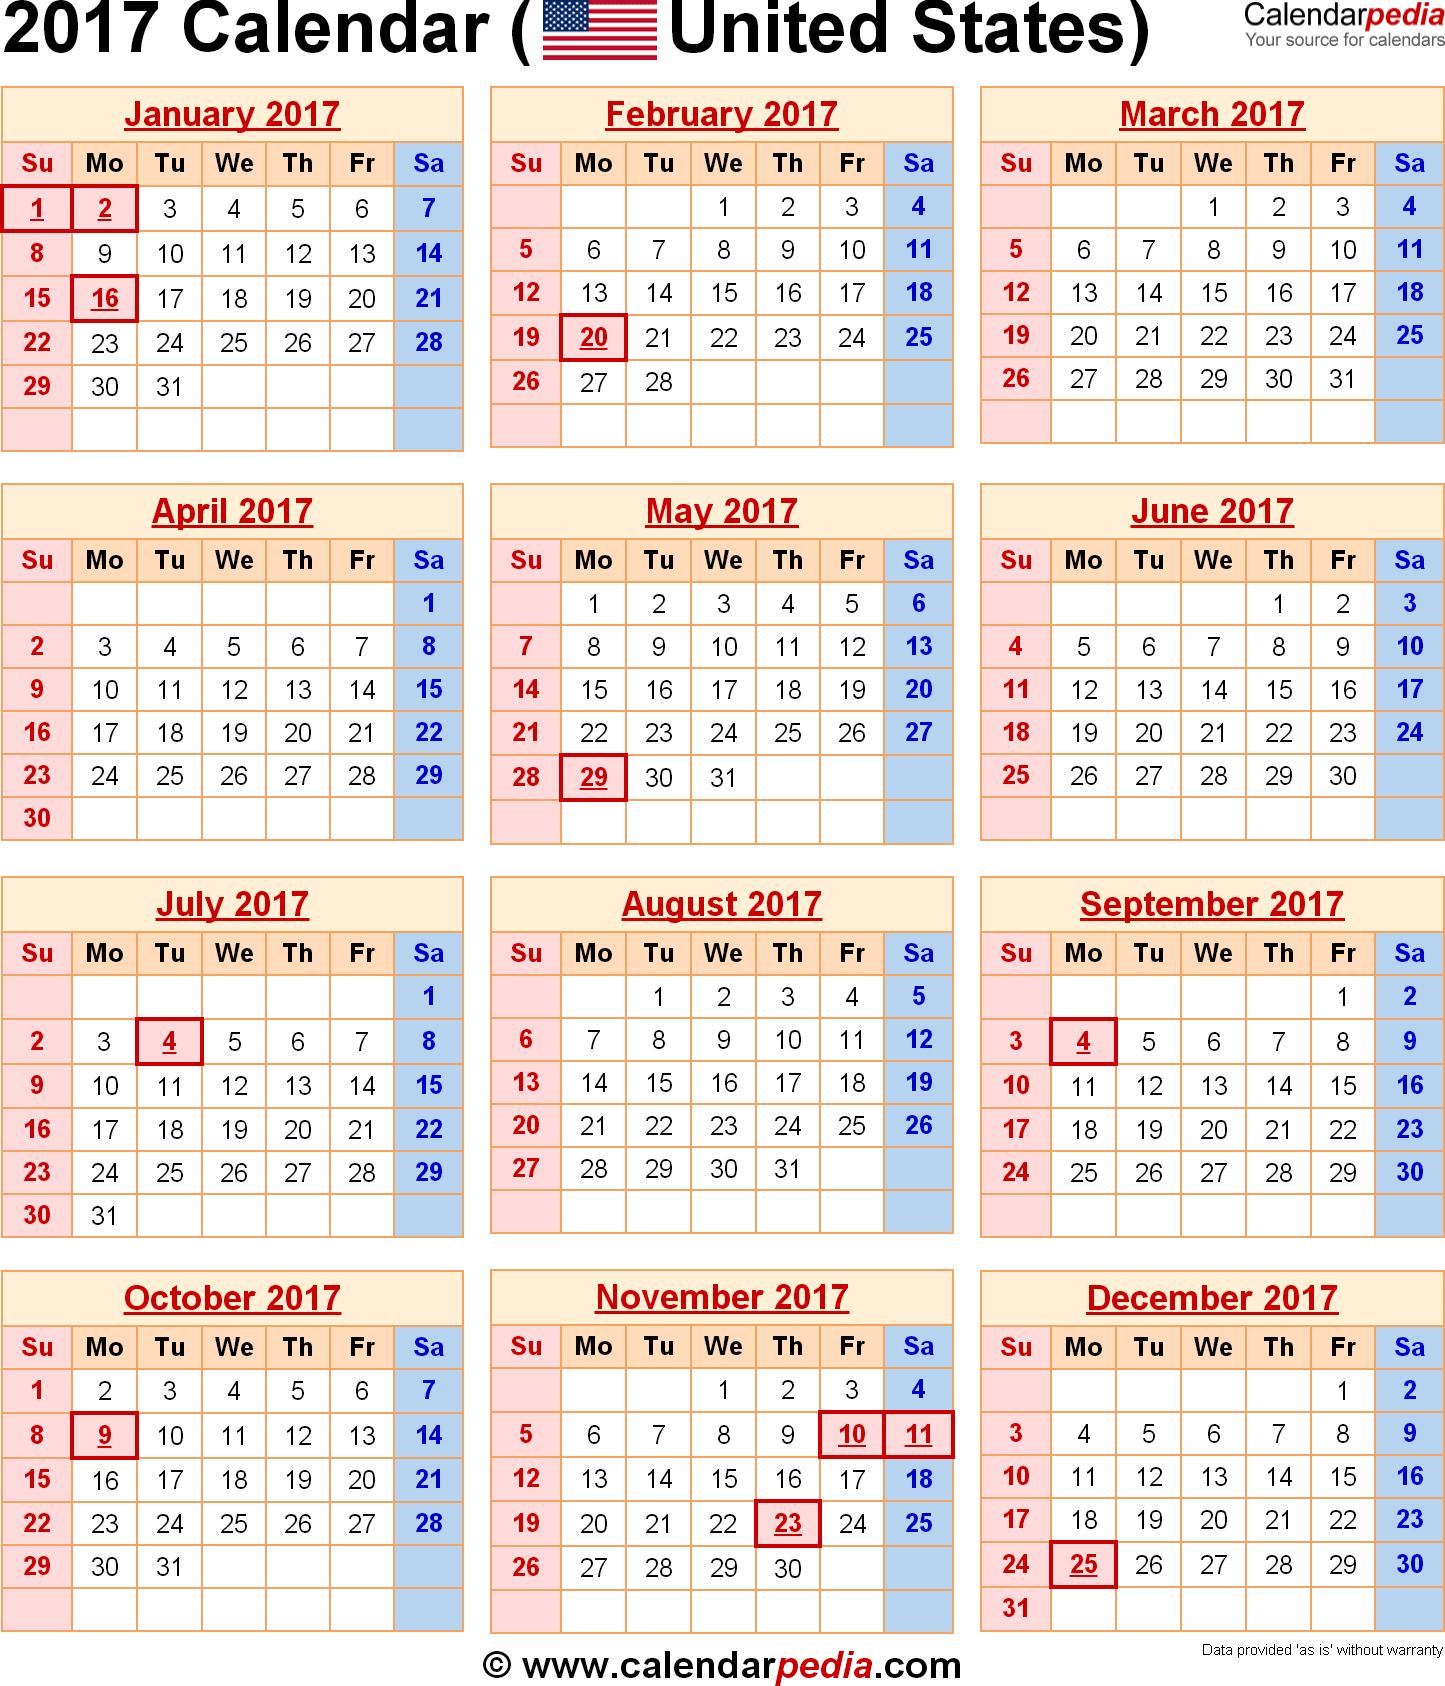 Calendar Holidays List : Usa holiday list printable calendar templates